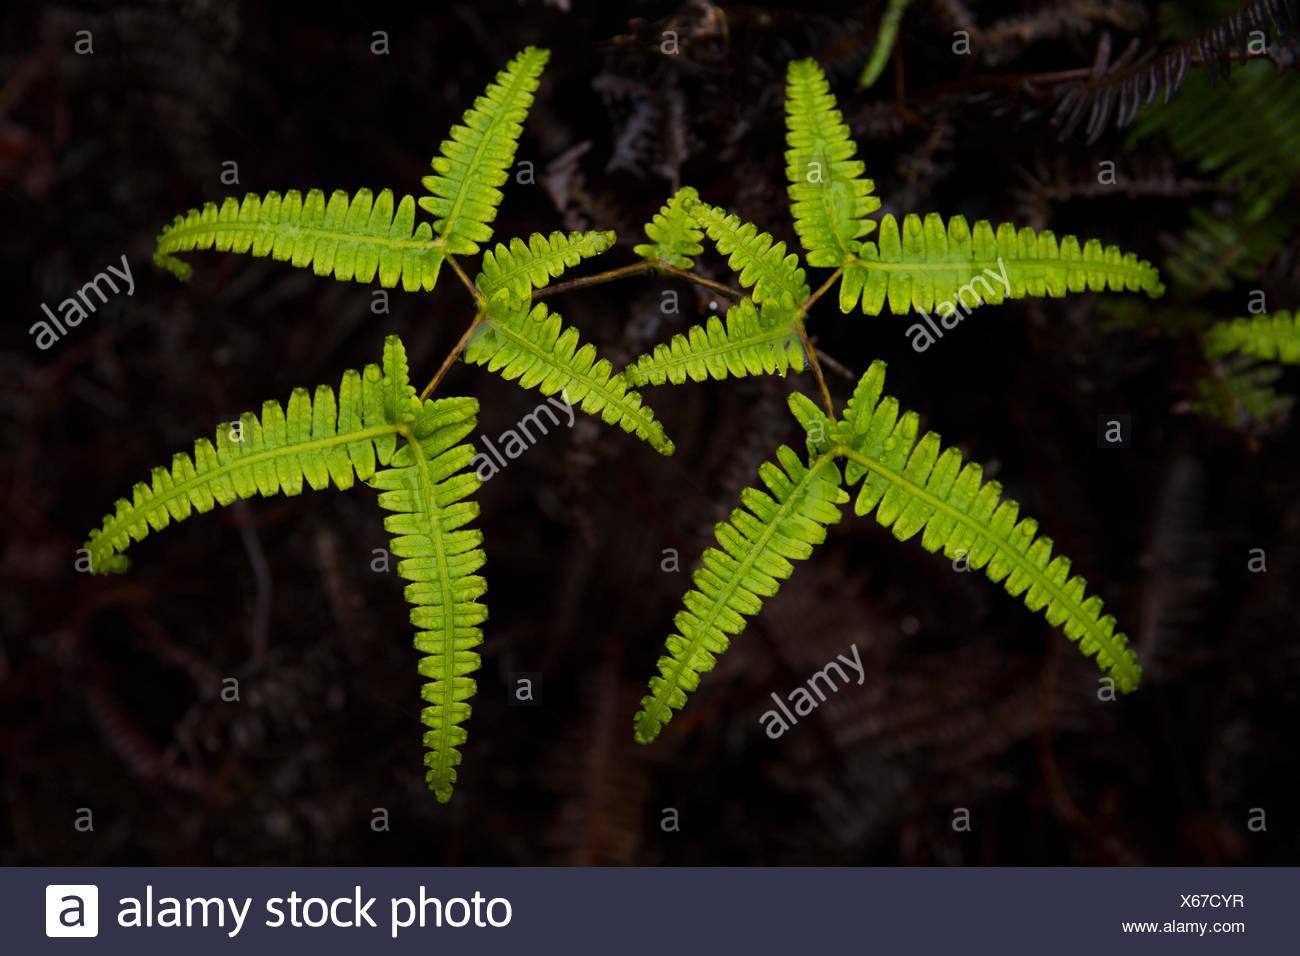 Kauai,piante,ben Pali Kona,riserva,STATI UNITI D'AMERICA,Hawaii,l'America,natura, Immagini Stock